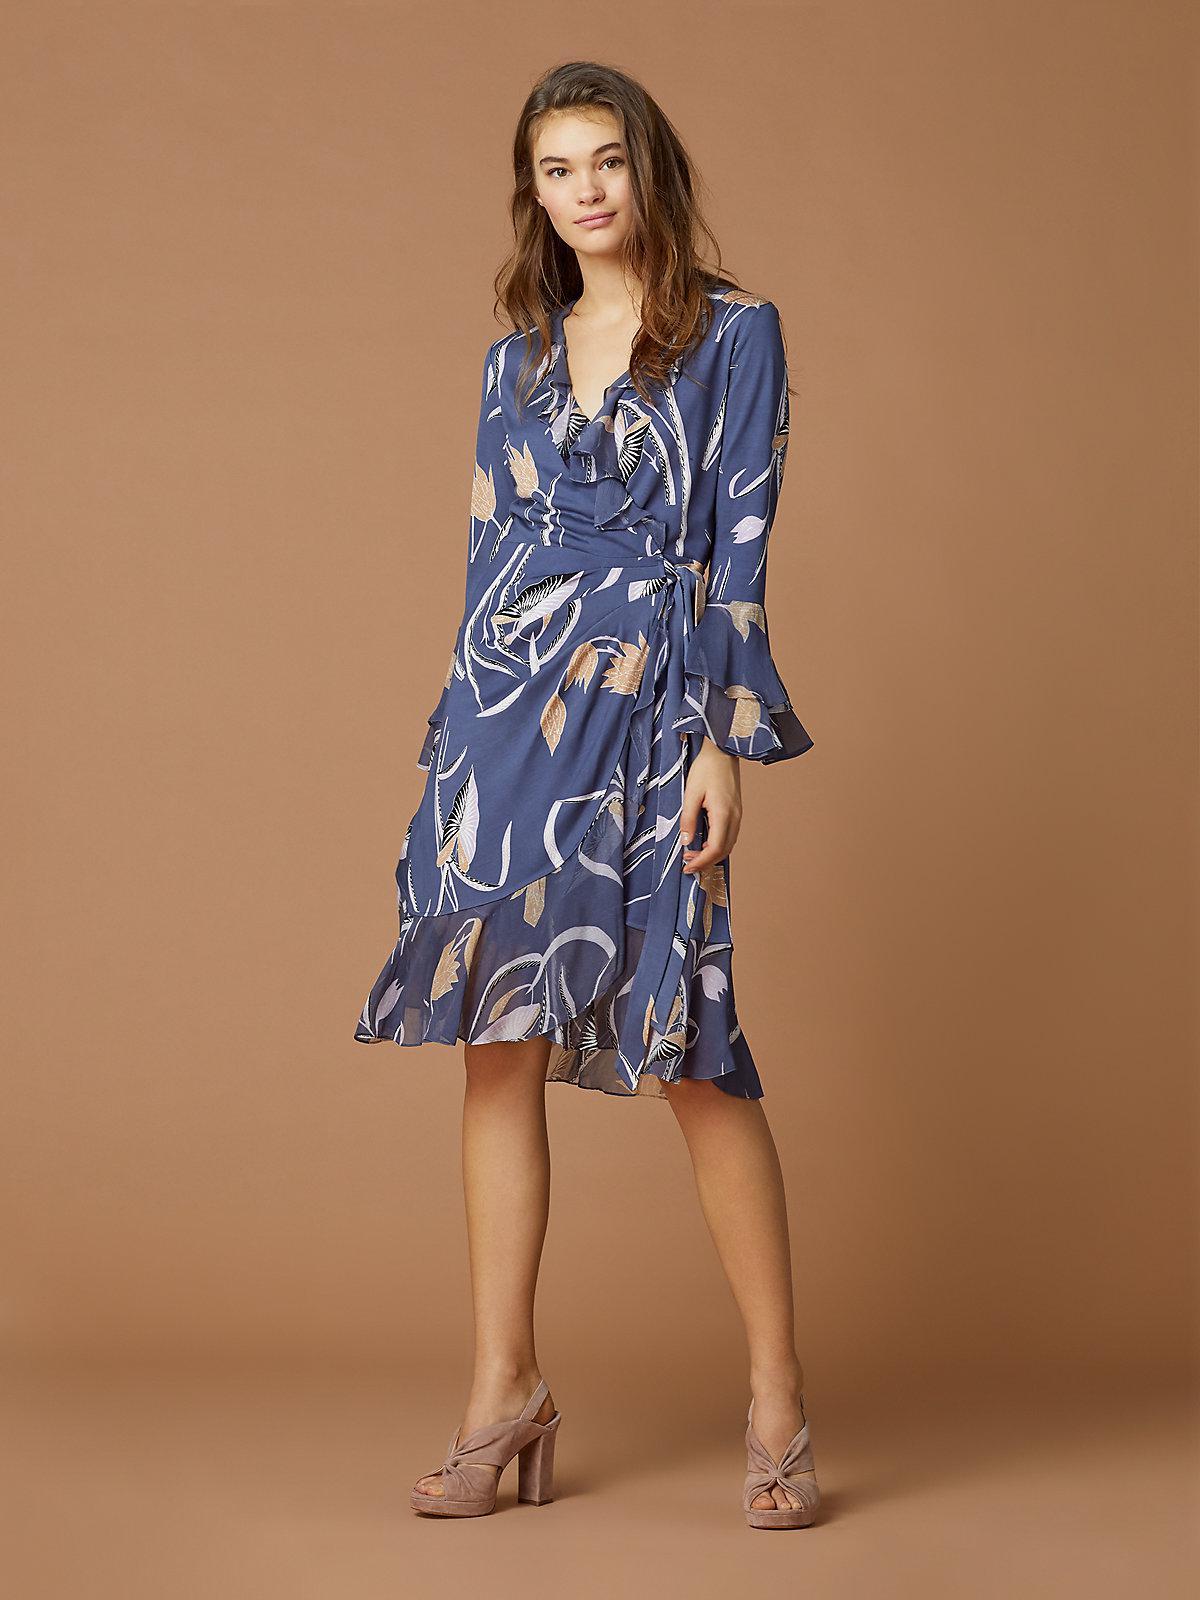 a3302adad07e Diane von Furstenberg Carli Wrap Dress in Blue - Lyst